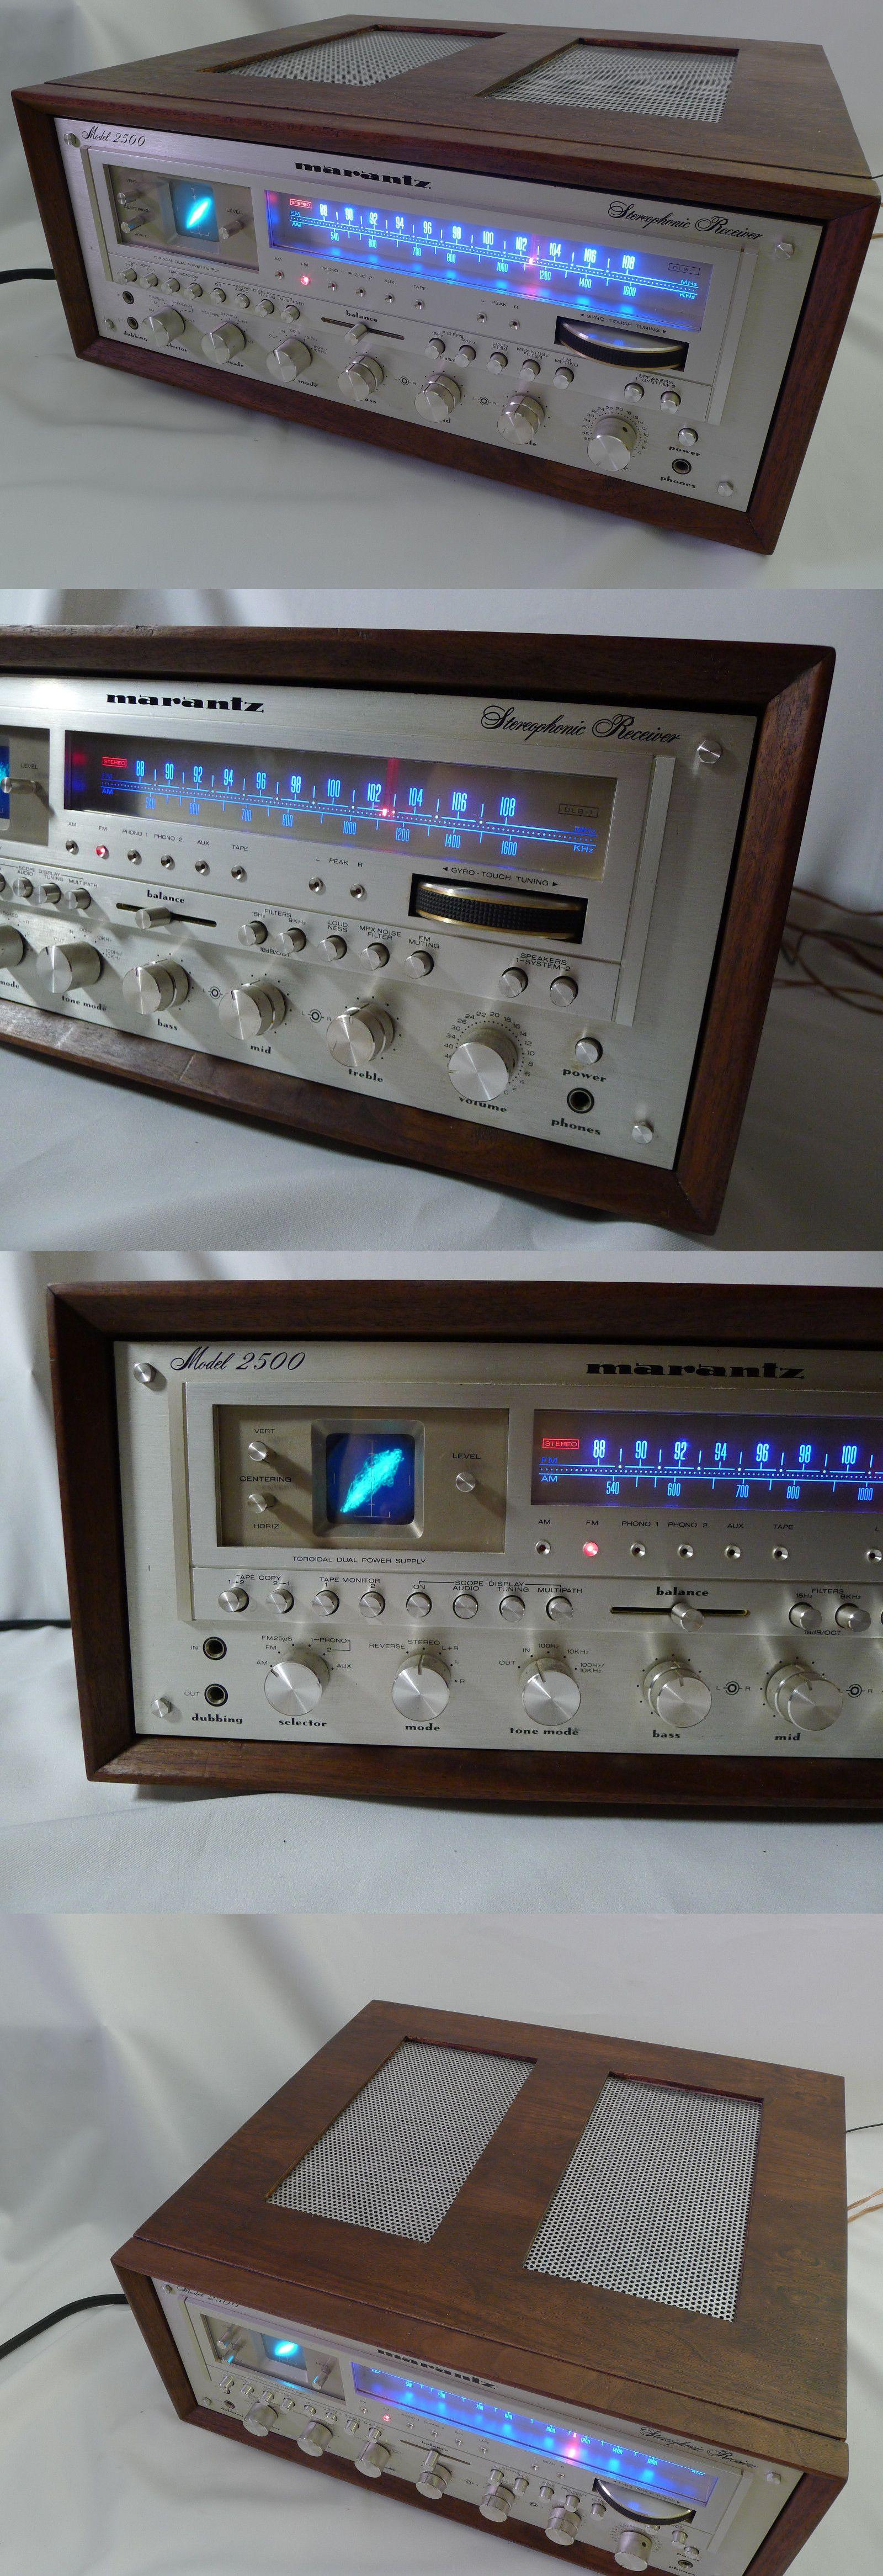 Vintage Stereo Receivers: Marantz 2500 Reciever With Custom